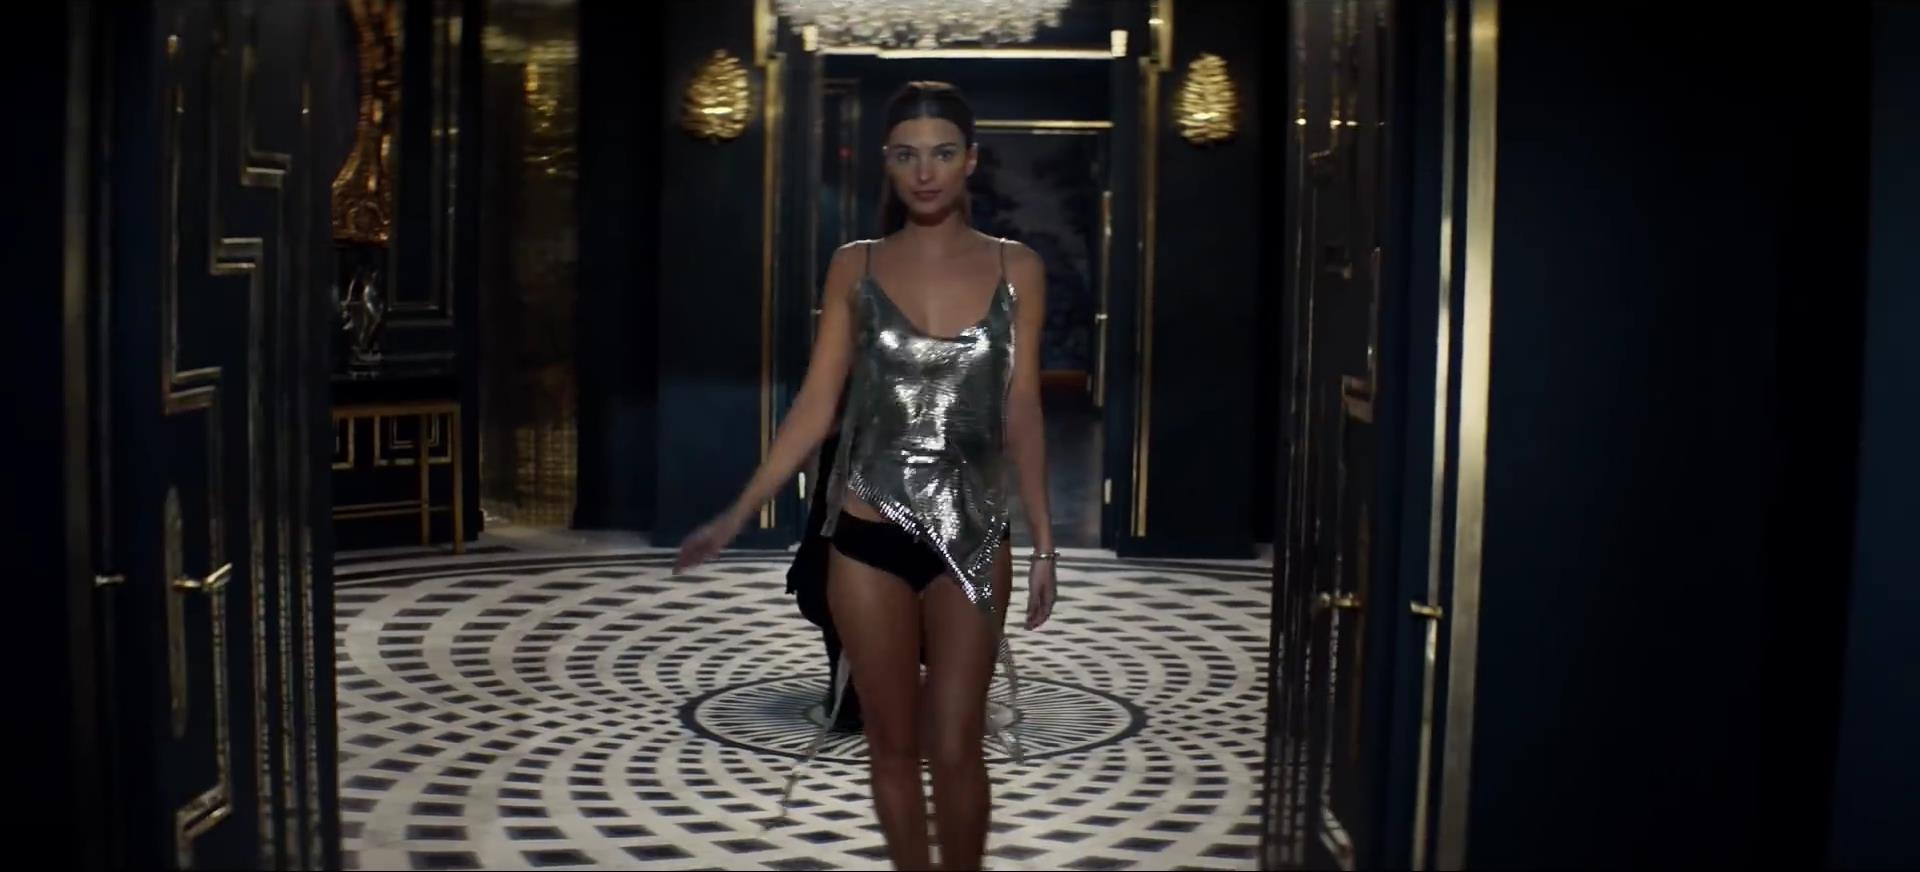 0919035859436_08_Emily-Ratajkowski-Sexy-Topless-Pics-TheFappeningBlog.com-5.jpg